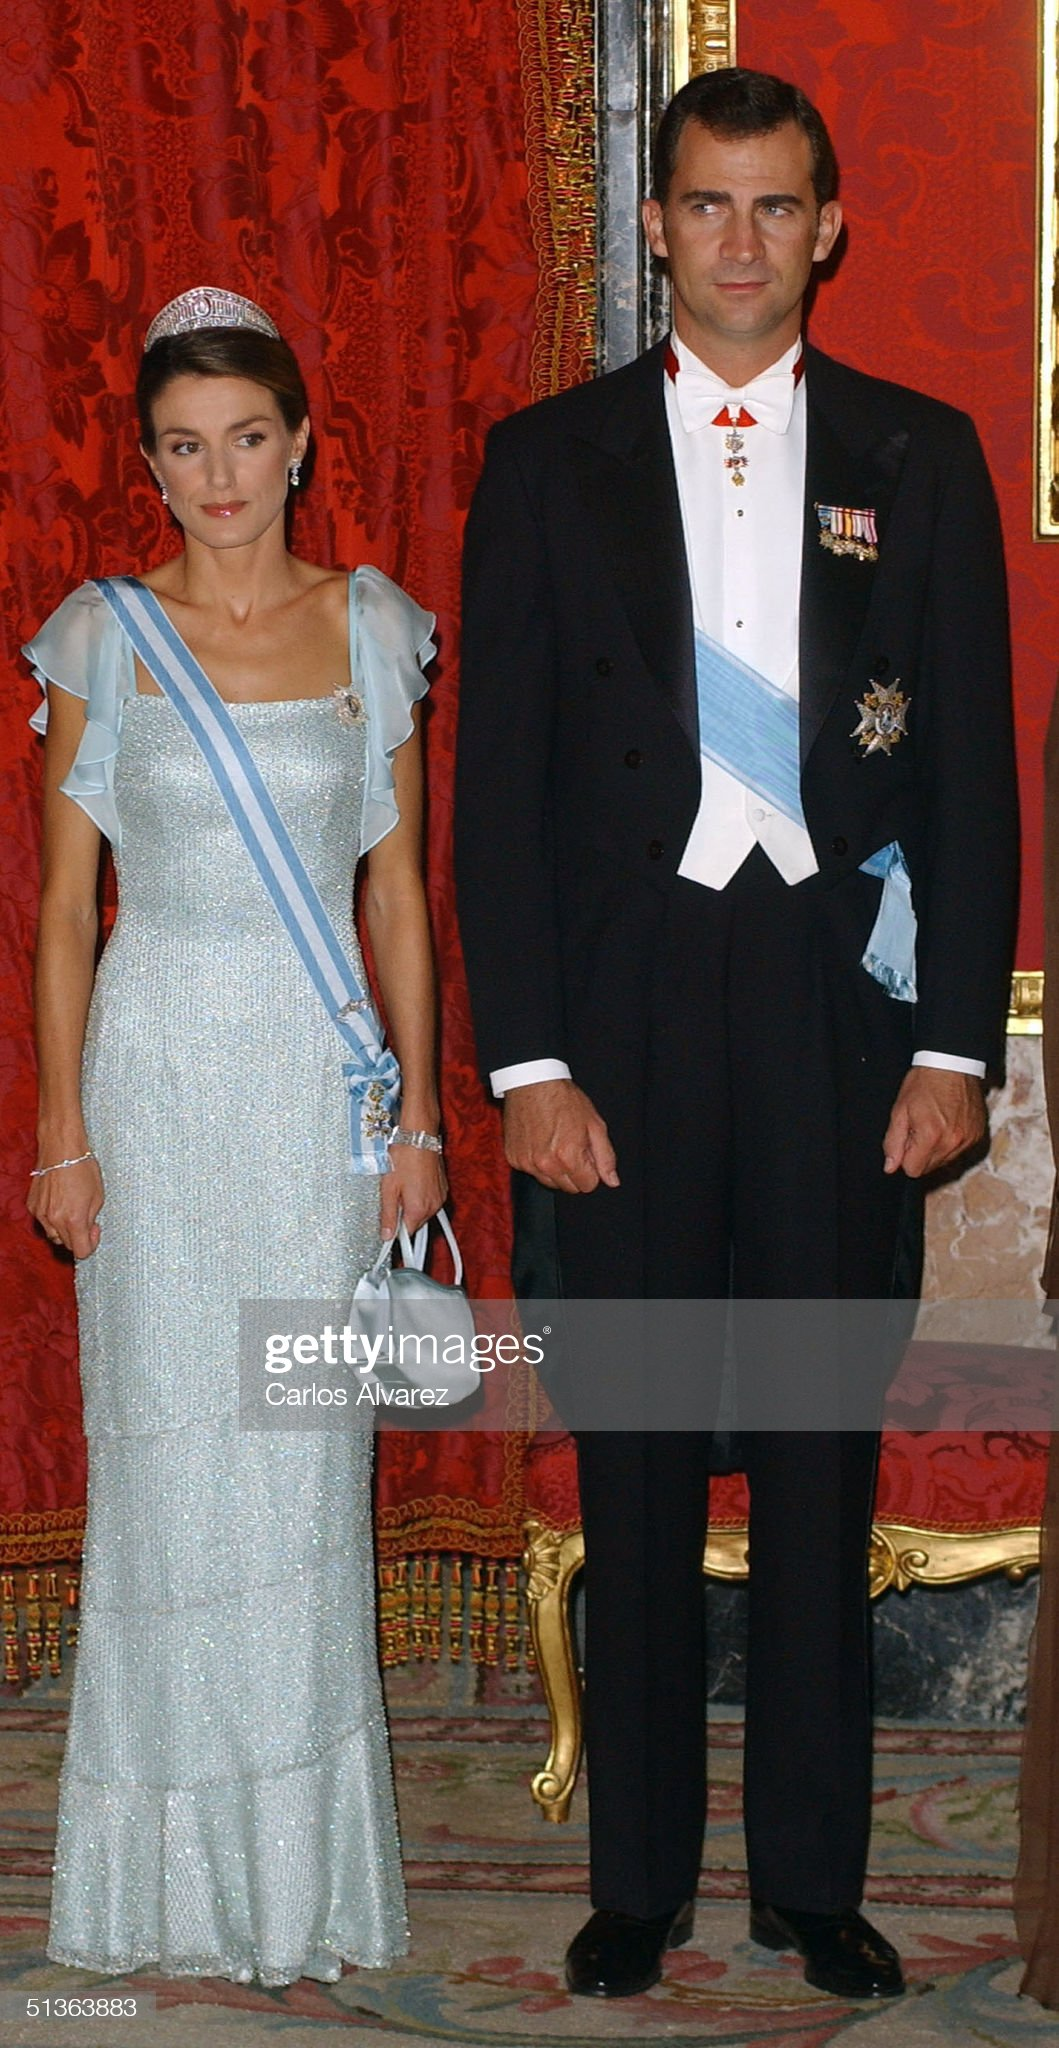 Вечерние наряды Королевы Летиции Spanish Royals Host Gala Dinner For Vaclav Klaus : News Photo